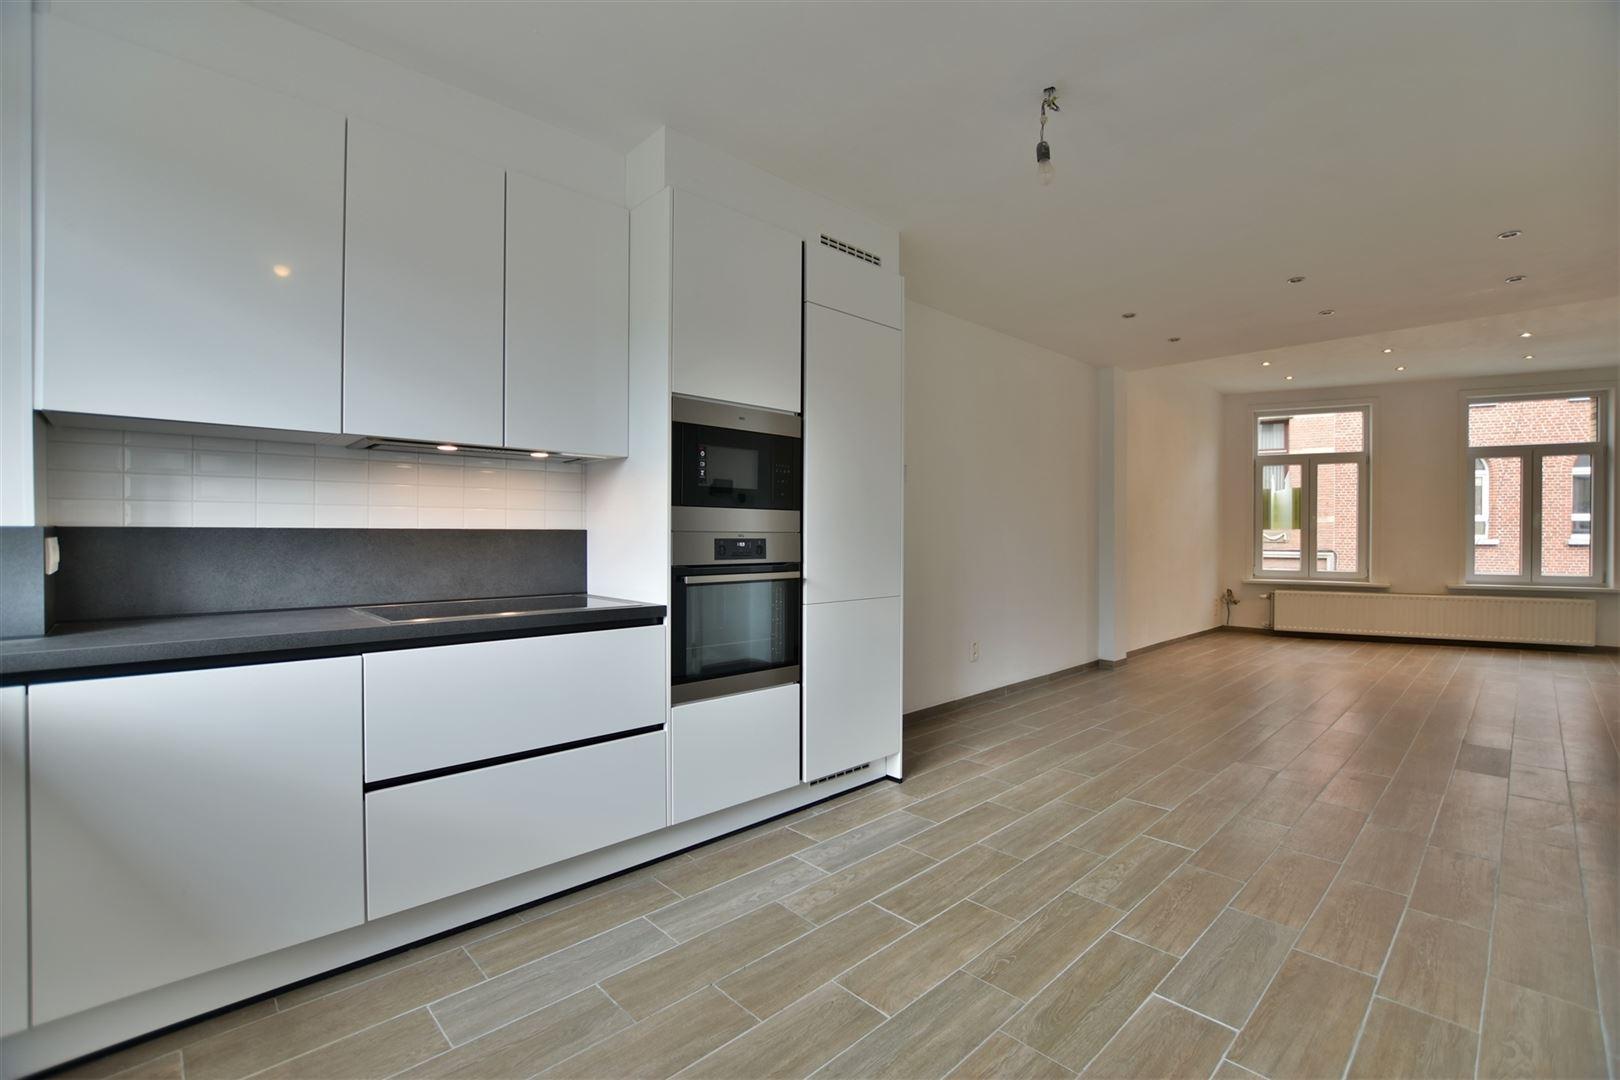 Foto 4 : Appartement te 9200 DENDERMONDE (België) - Prijs € 299.000